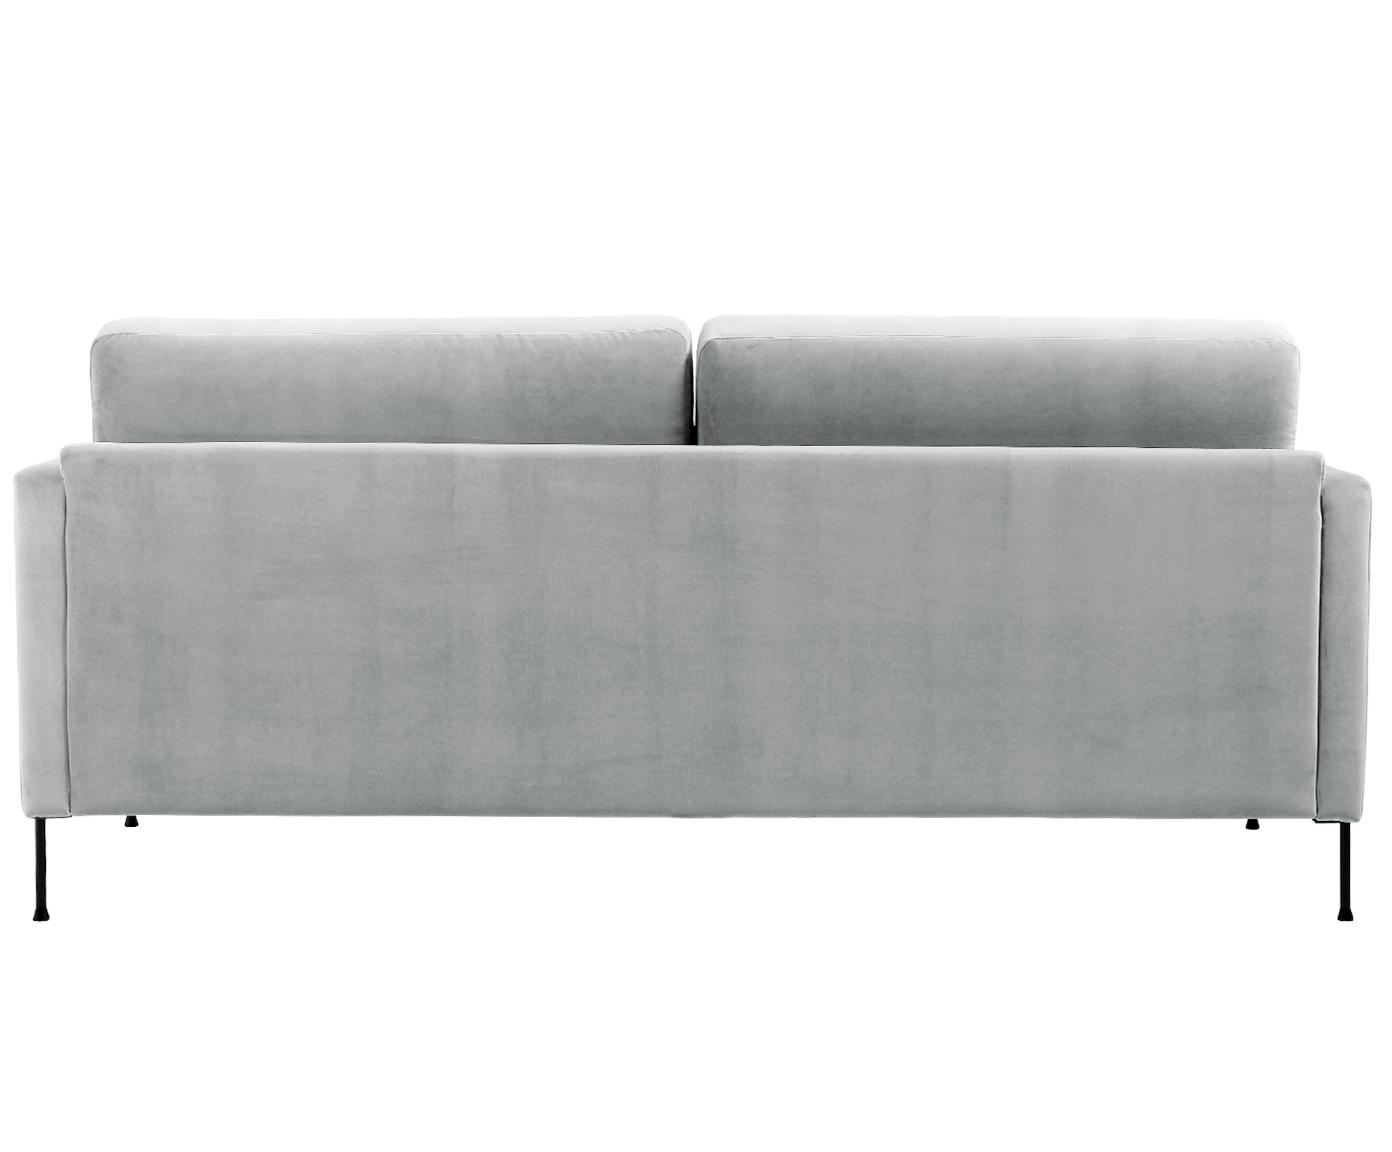 Samt-Sofa Fluente (3-Sitzer), Bezug: Samt (Hochwertiger Polyes, Gestell: Massives Kiefernholz, Füße: Metall, lackiert, Samt Hellgrau, B 197 x T 83 cm